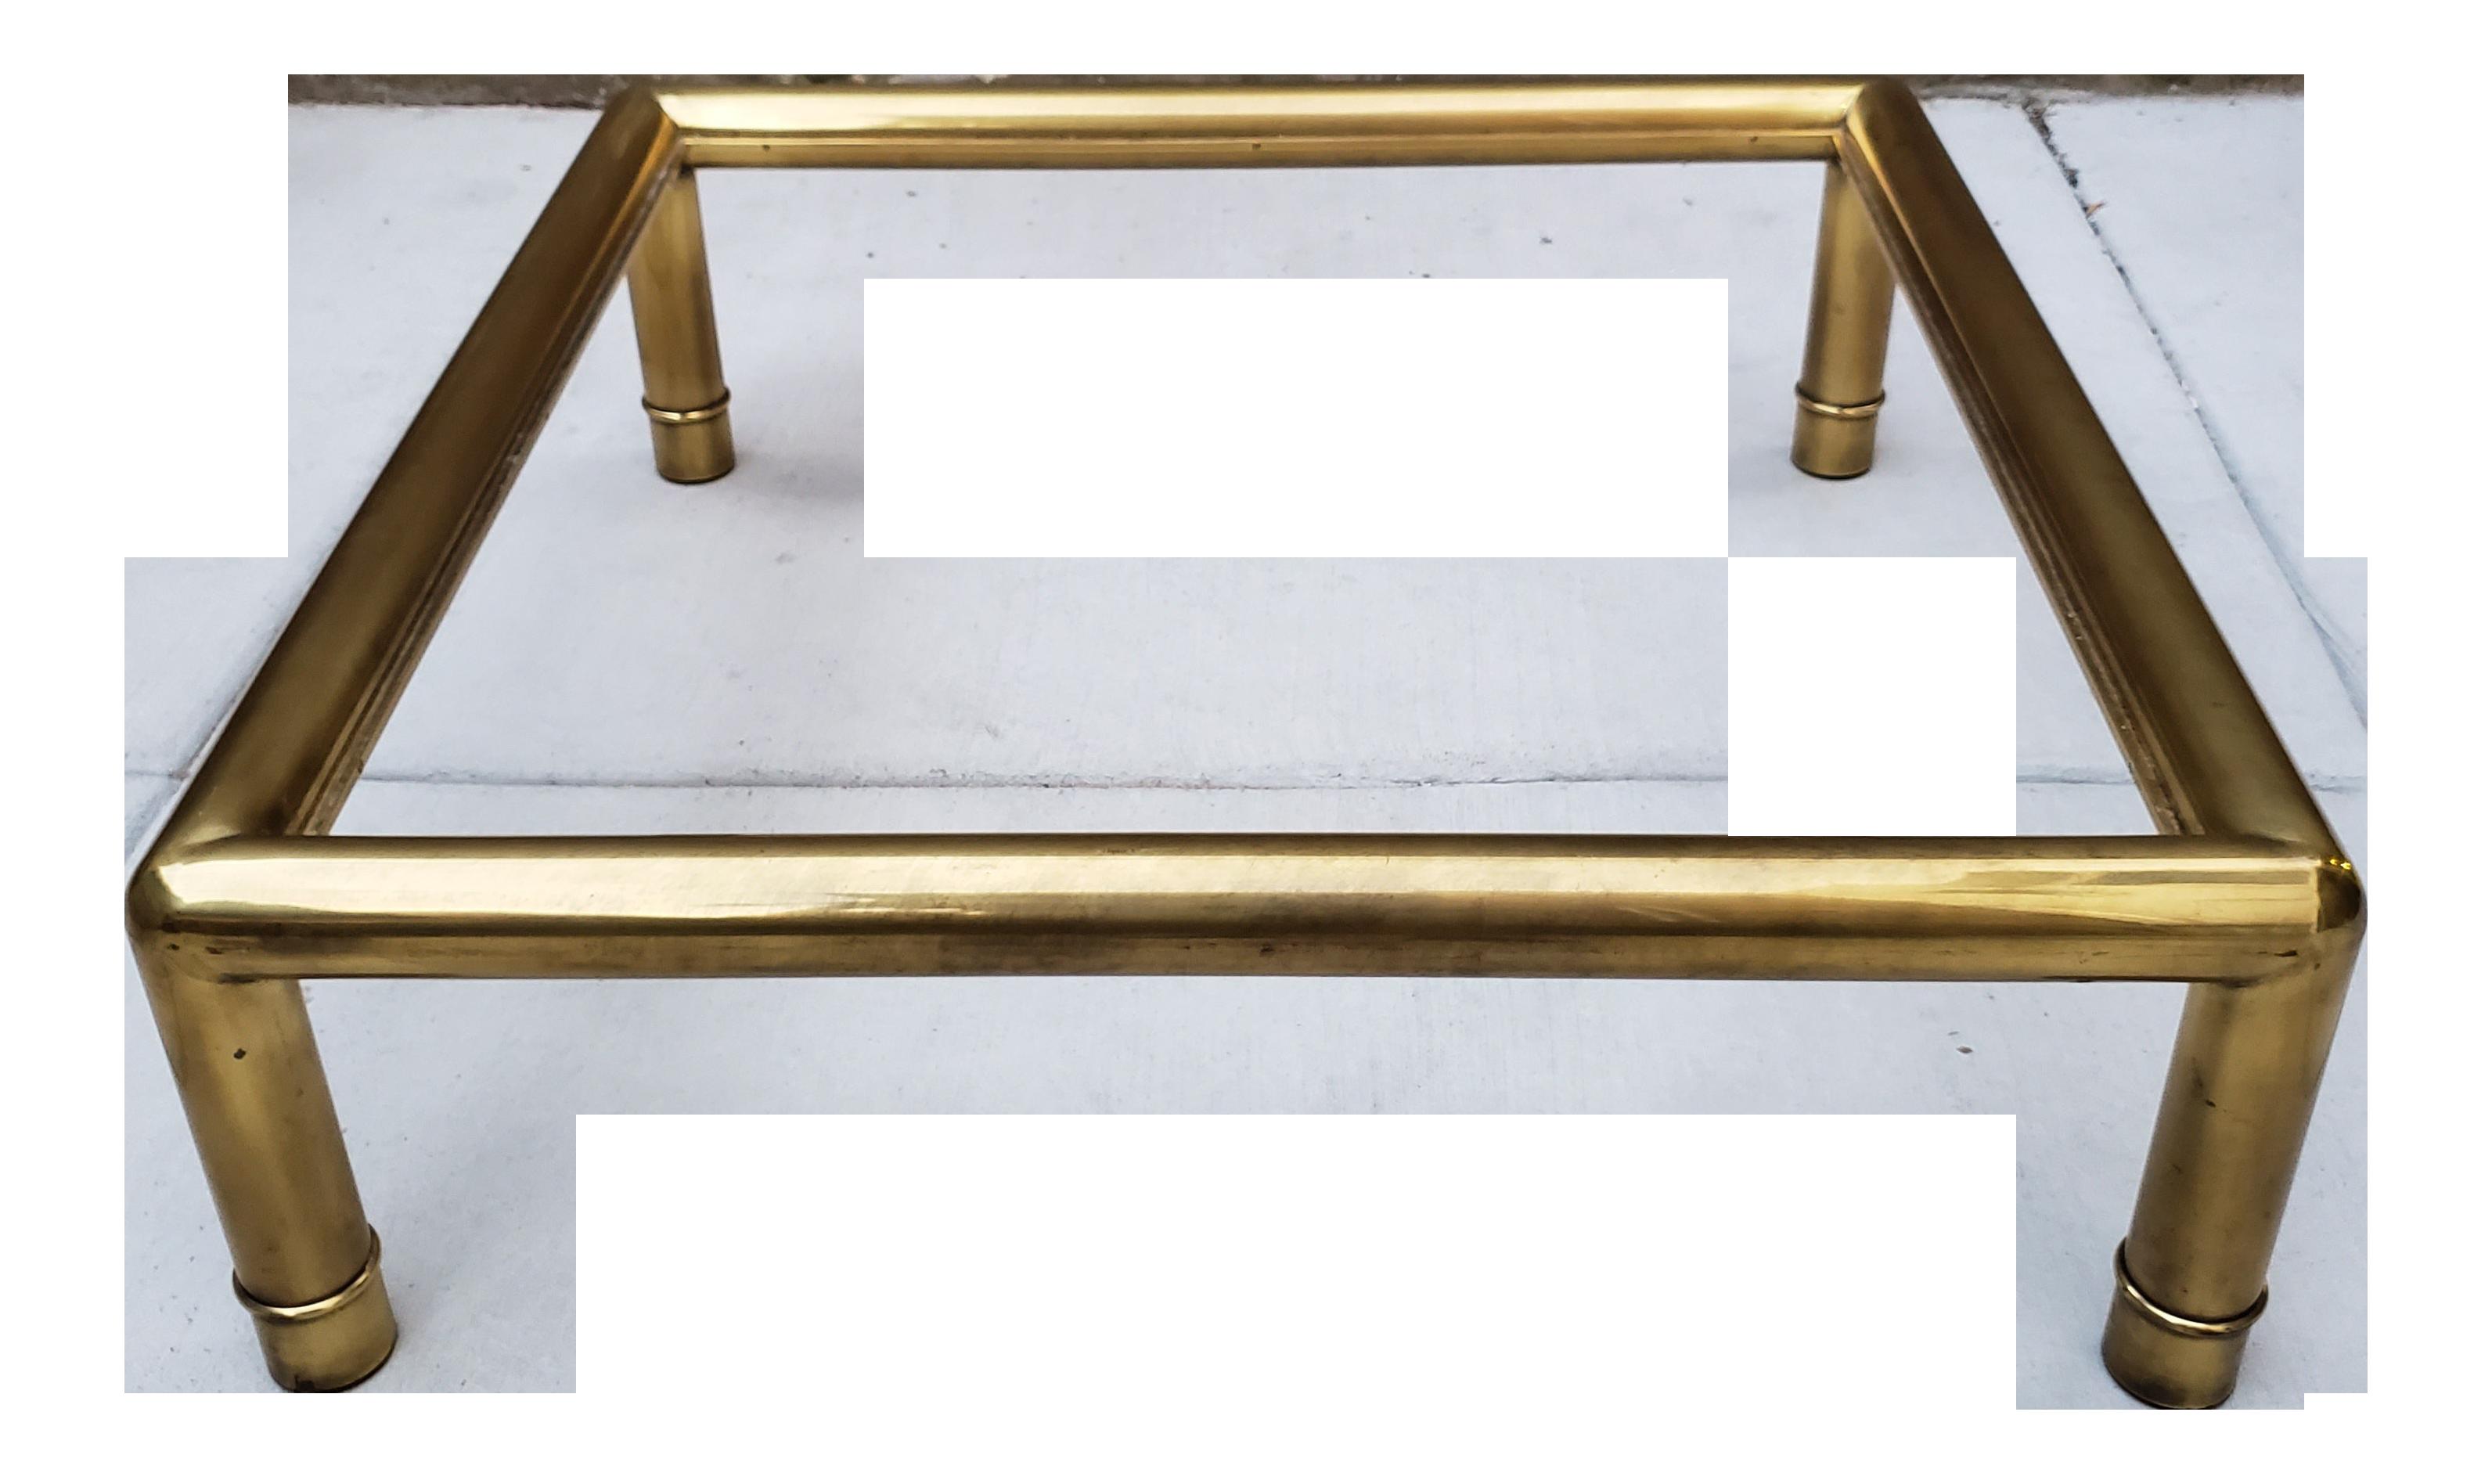 20th Century Hollywood Regency Mastercraft Tubular Brass Glass Coffee Table On Chairish Com Glass Coffee Table Coffee Table Glass Table